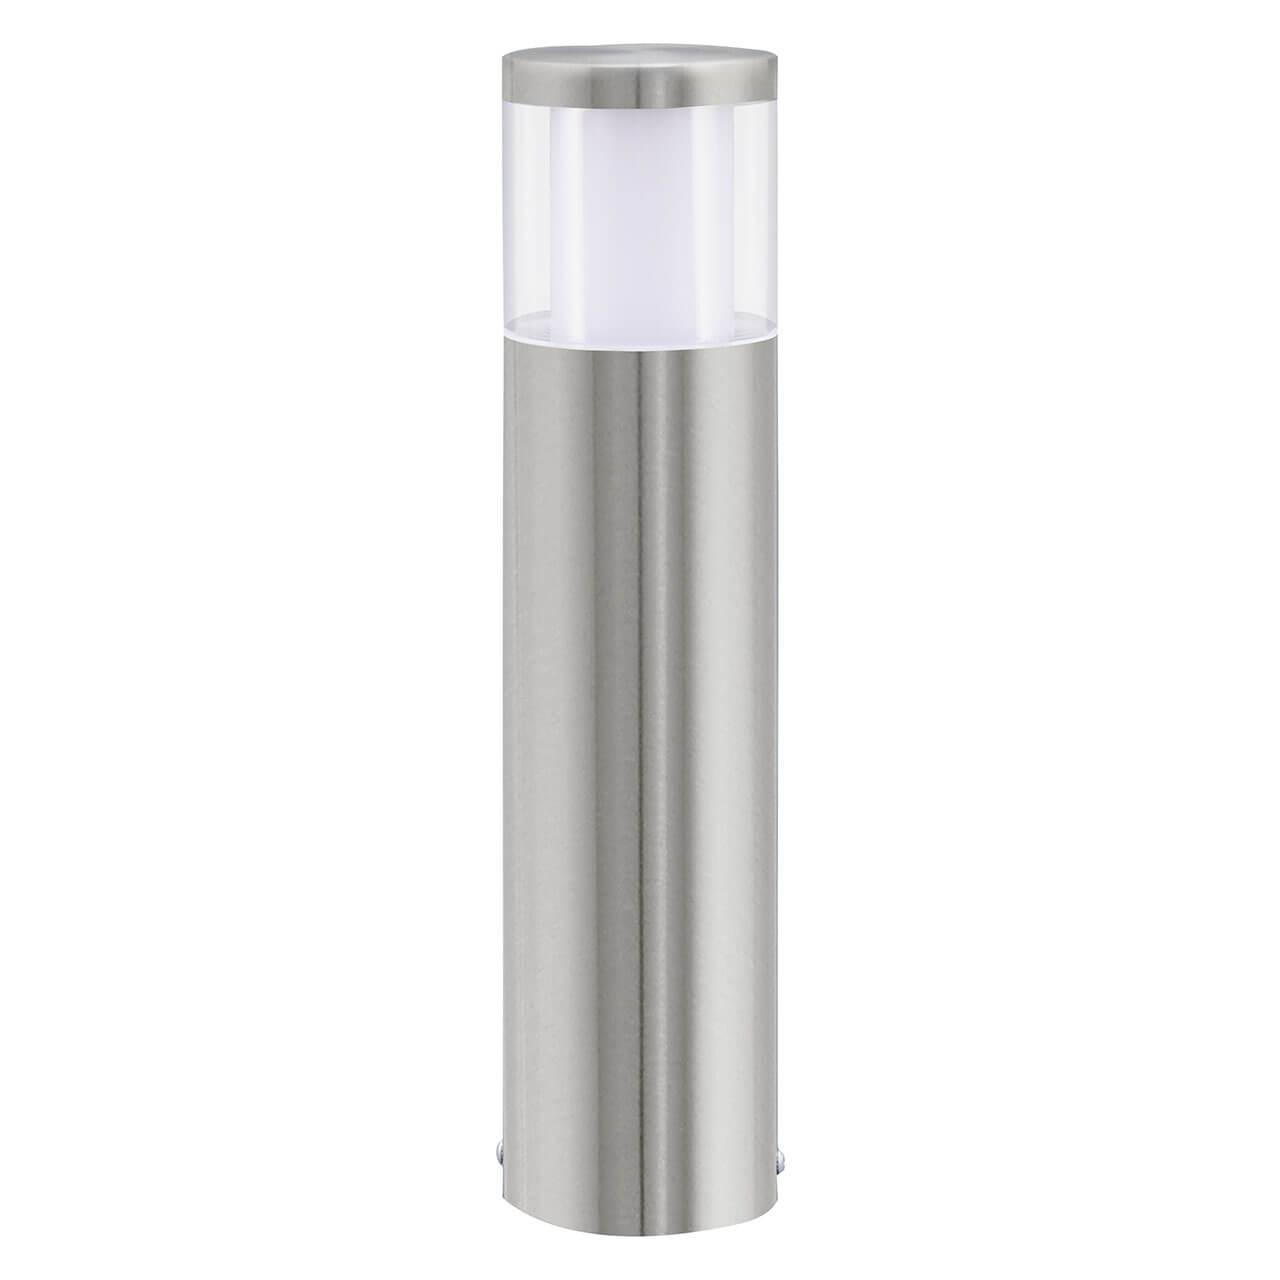 Уличный светильник Eglo 94278, LED цены